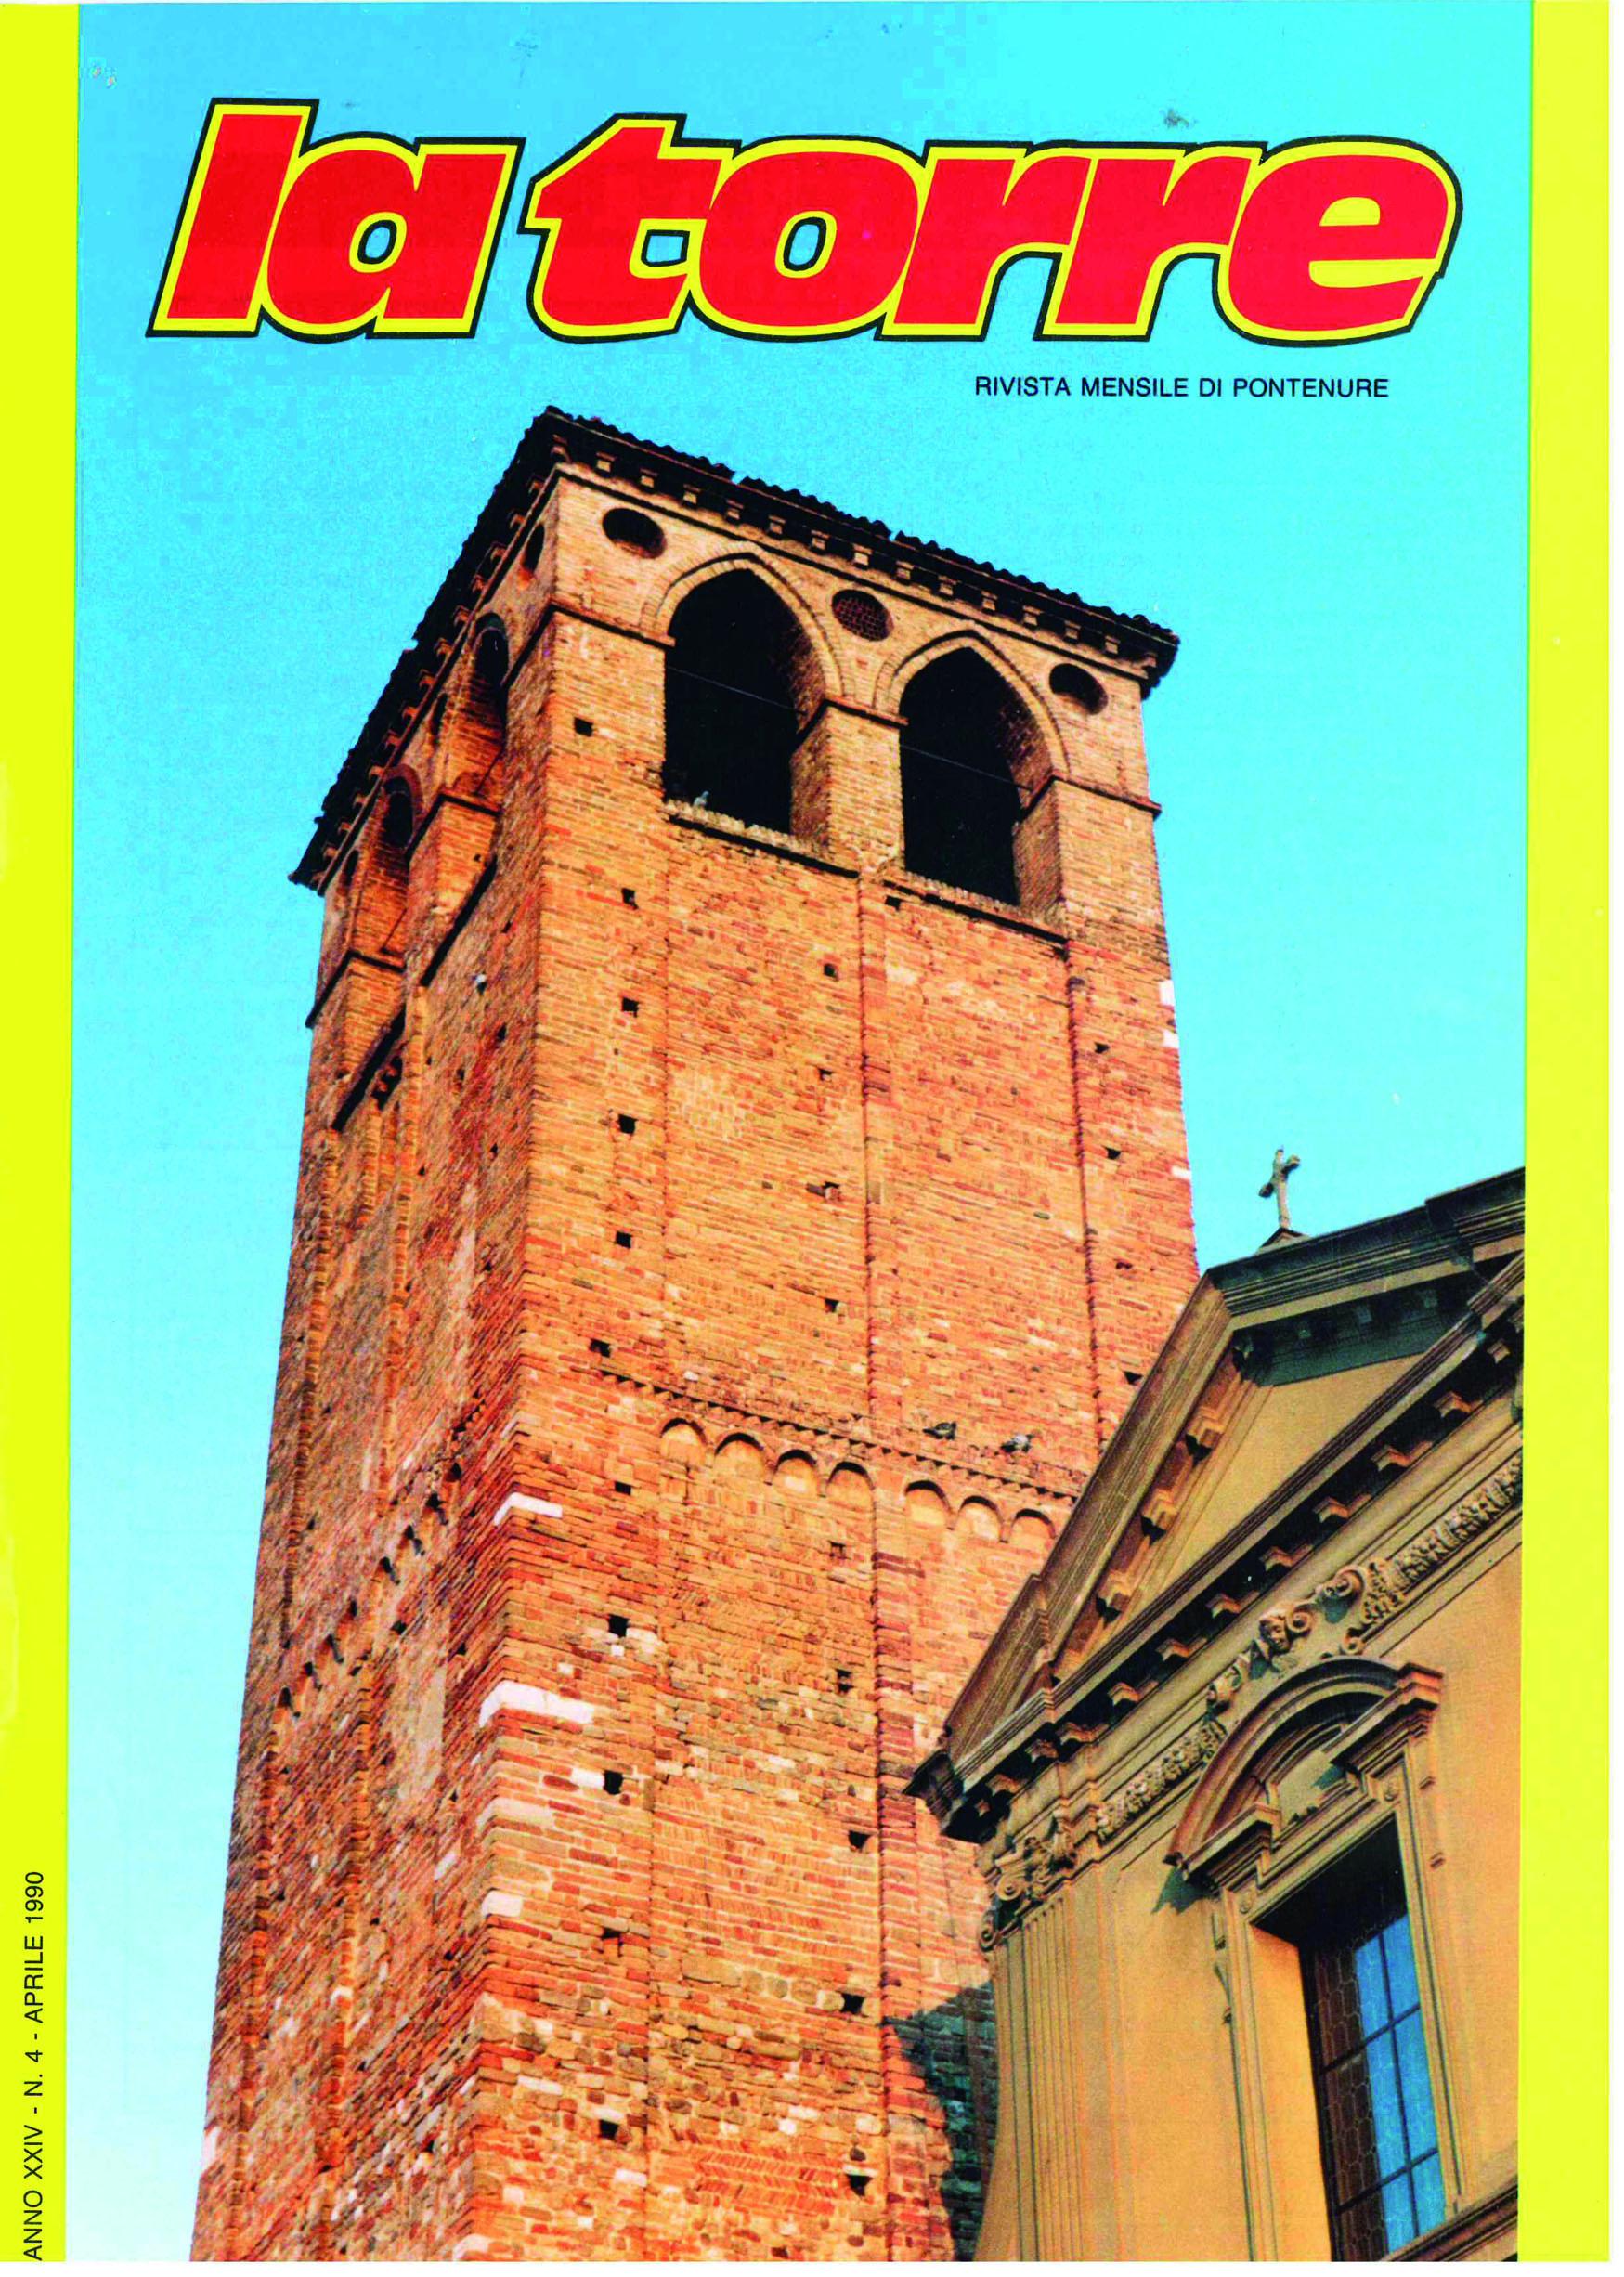 copertina la torre 1990